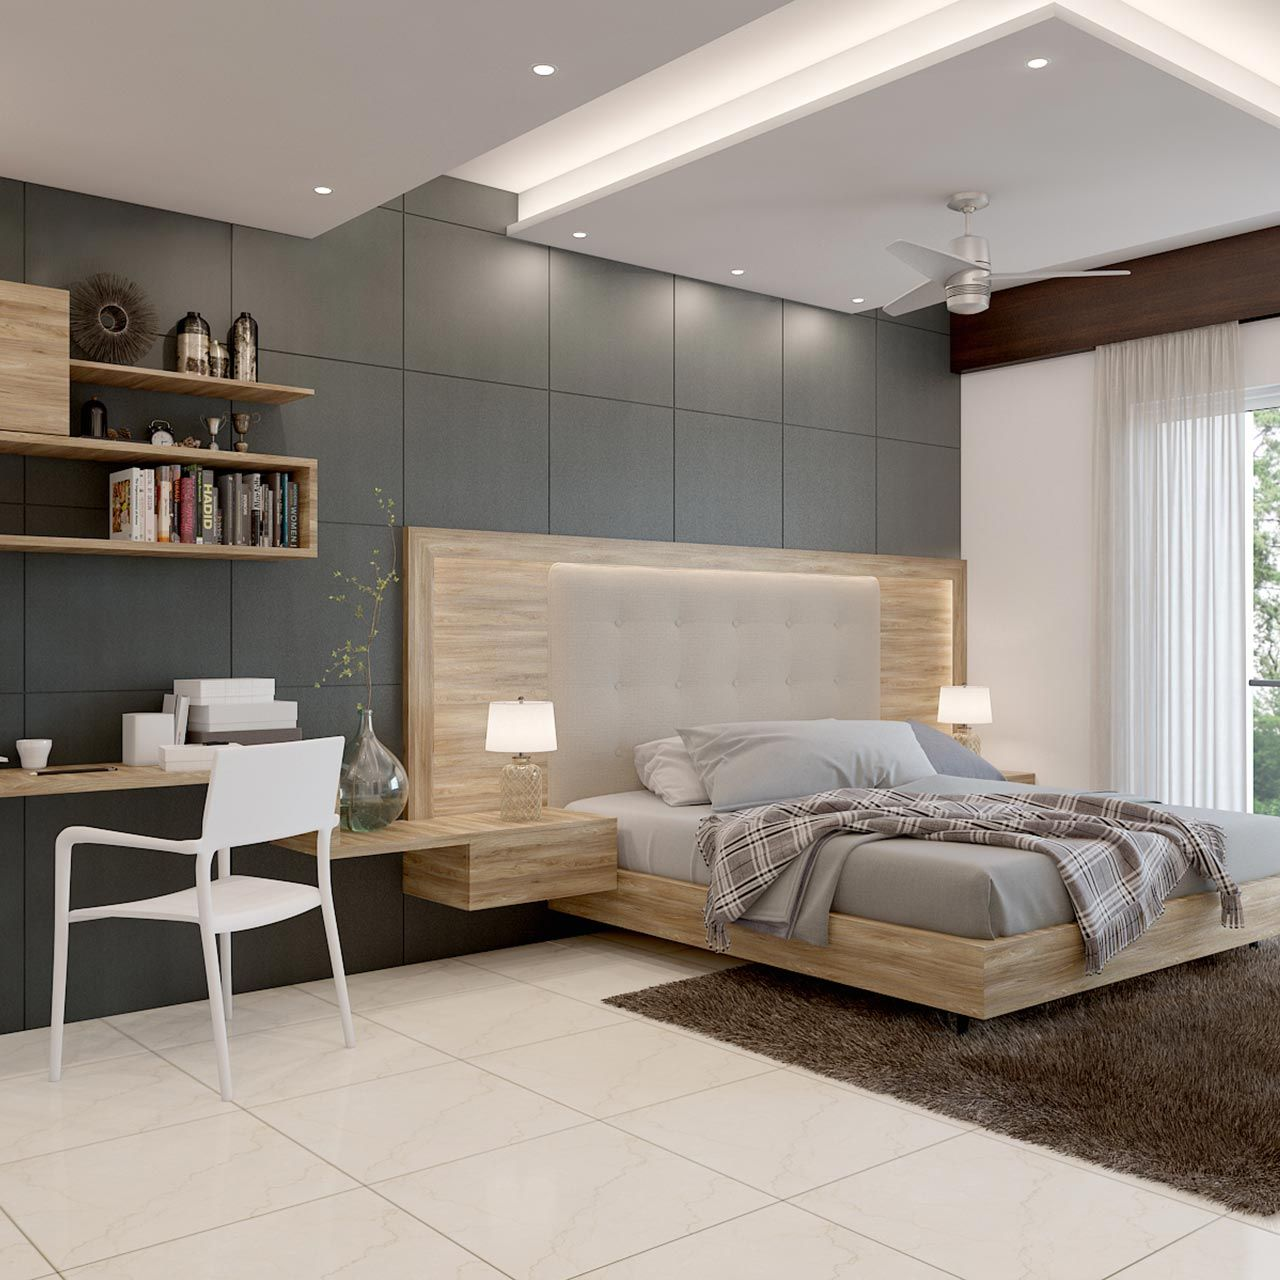 Best False Ceiling Designs For Your Bedroom Design Cafe | Bedroom false  ceiling design, Best false ceiling designs, Ceiling design living room